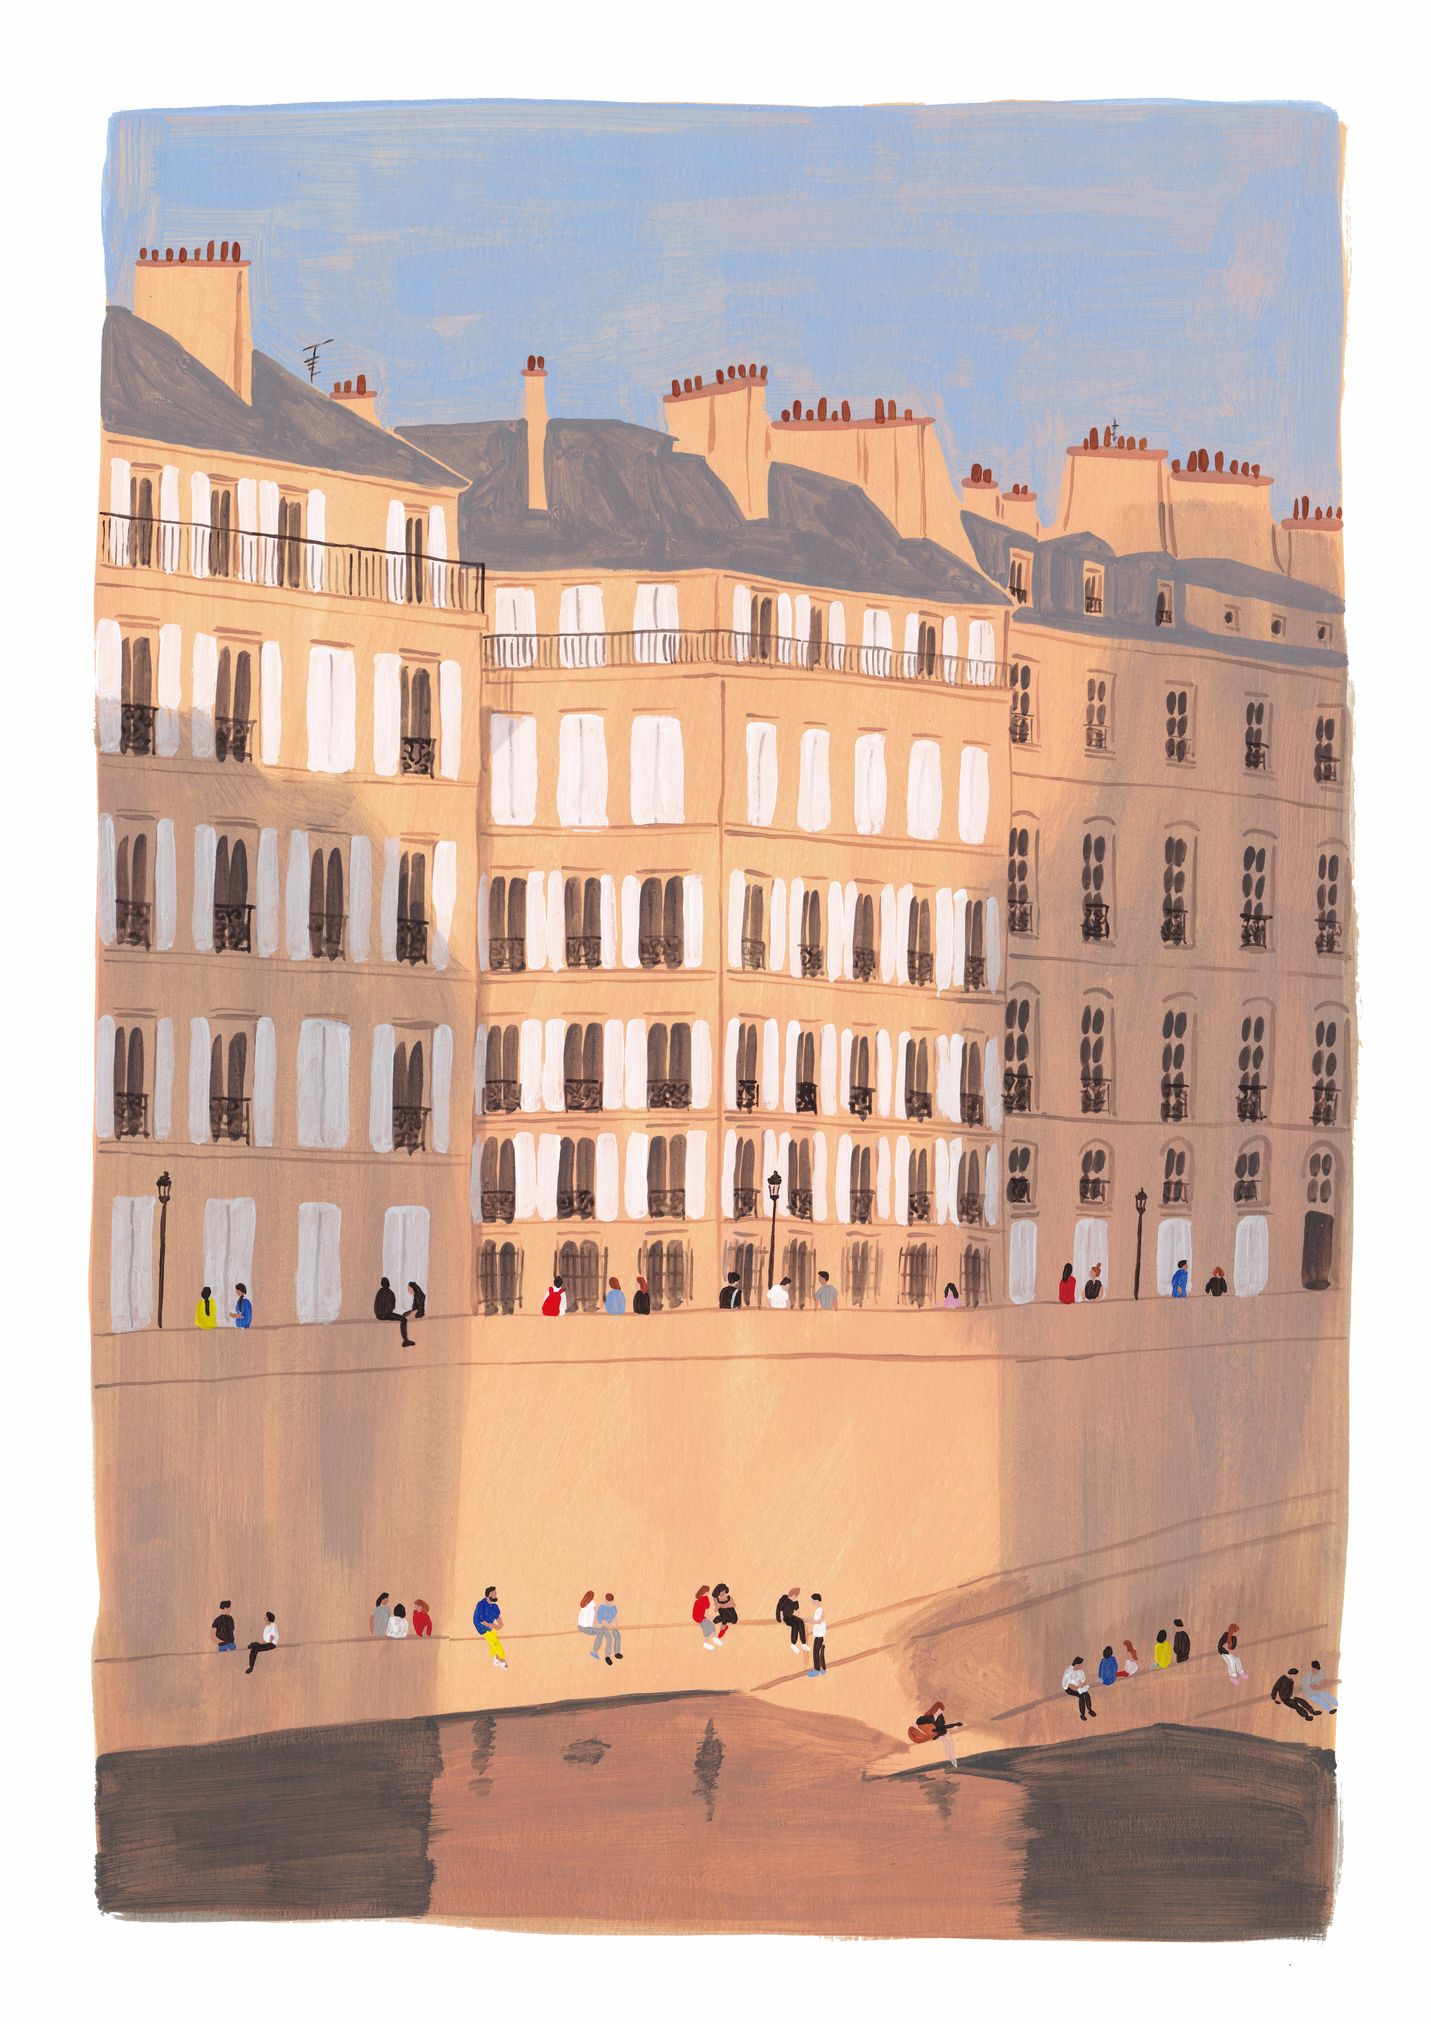 garance-illustration-Yukiko-Noritake-Projet-perso_5_Serie-de-Paris_web